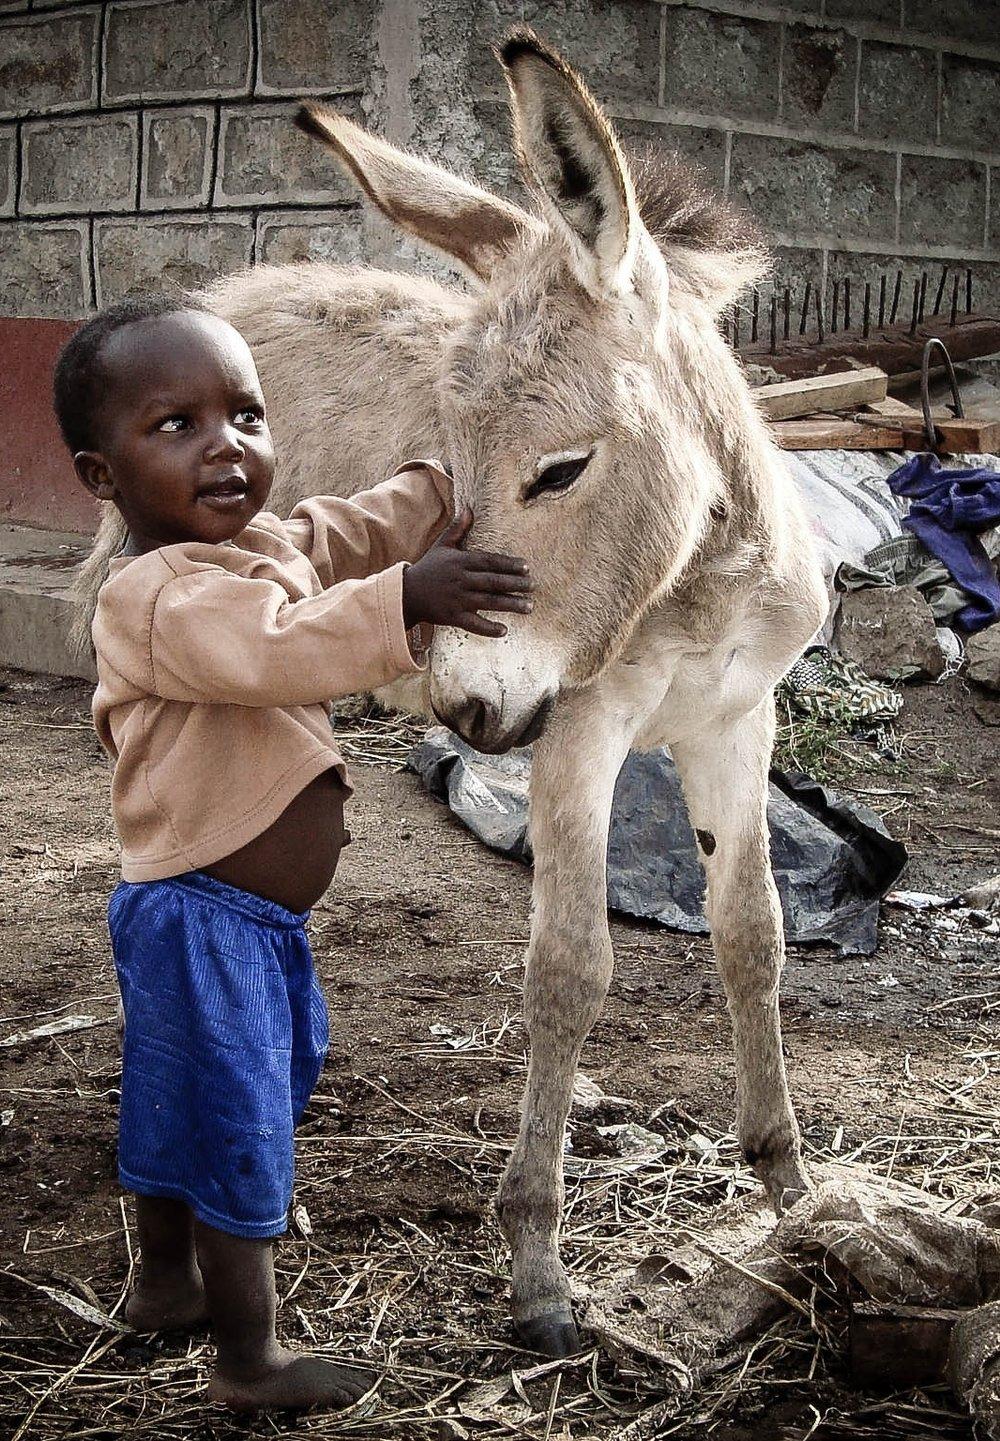 Boy and donkey foal in Kenya. www.BrookeUSA.org.jpg